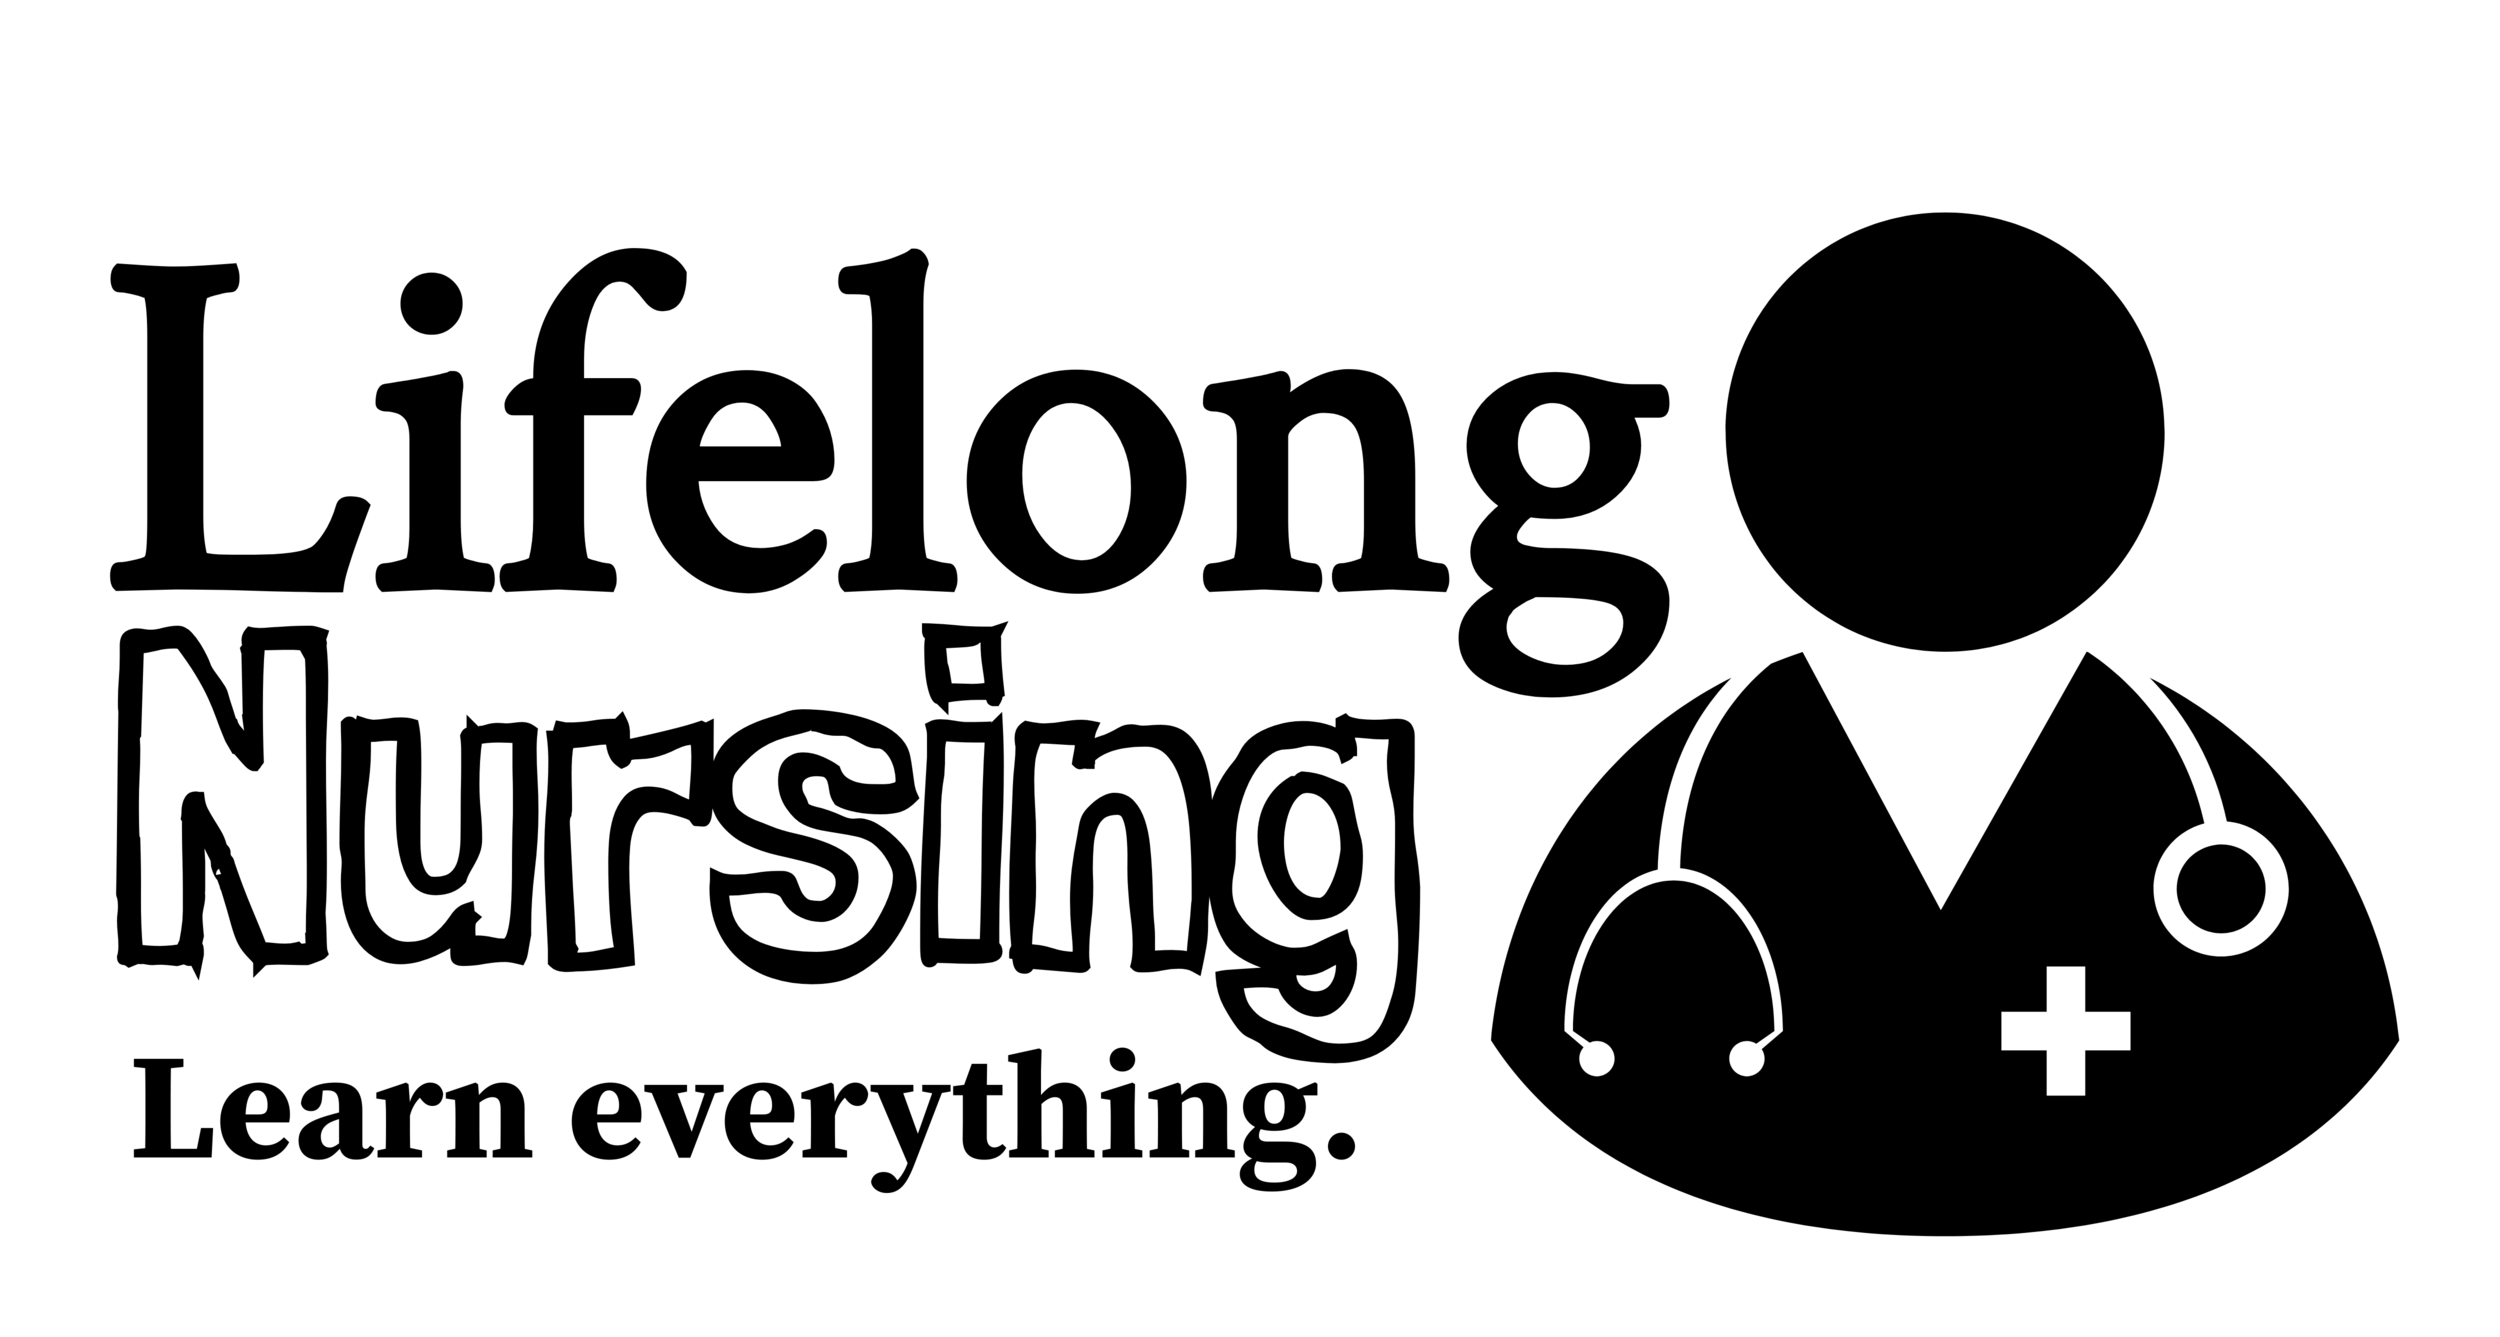 Lifelong-logo-black11.png